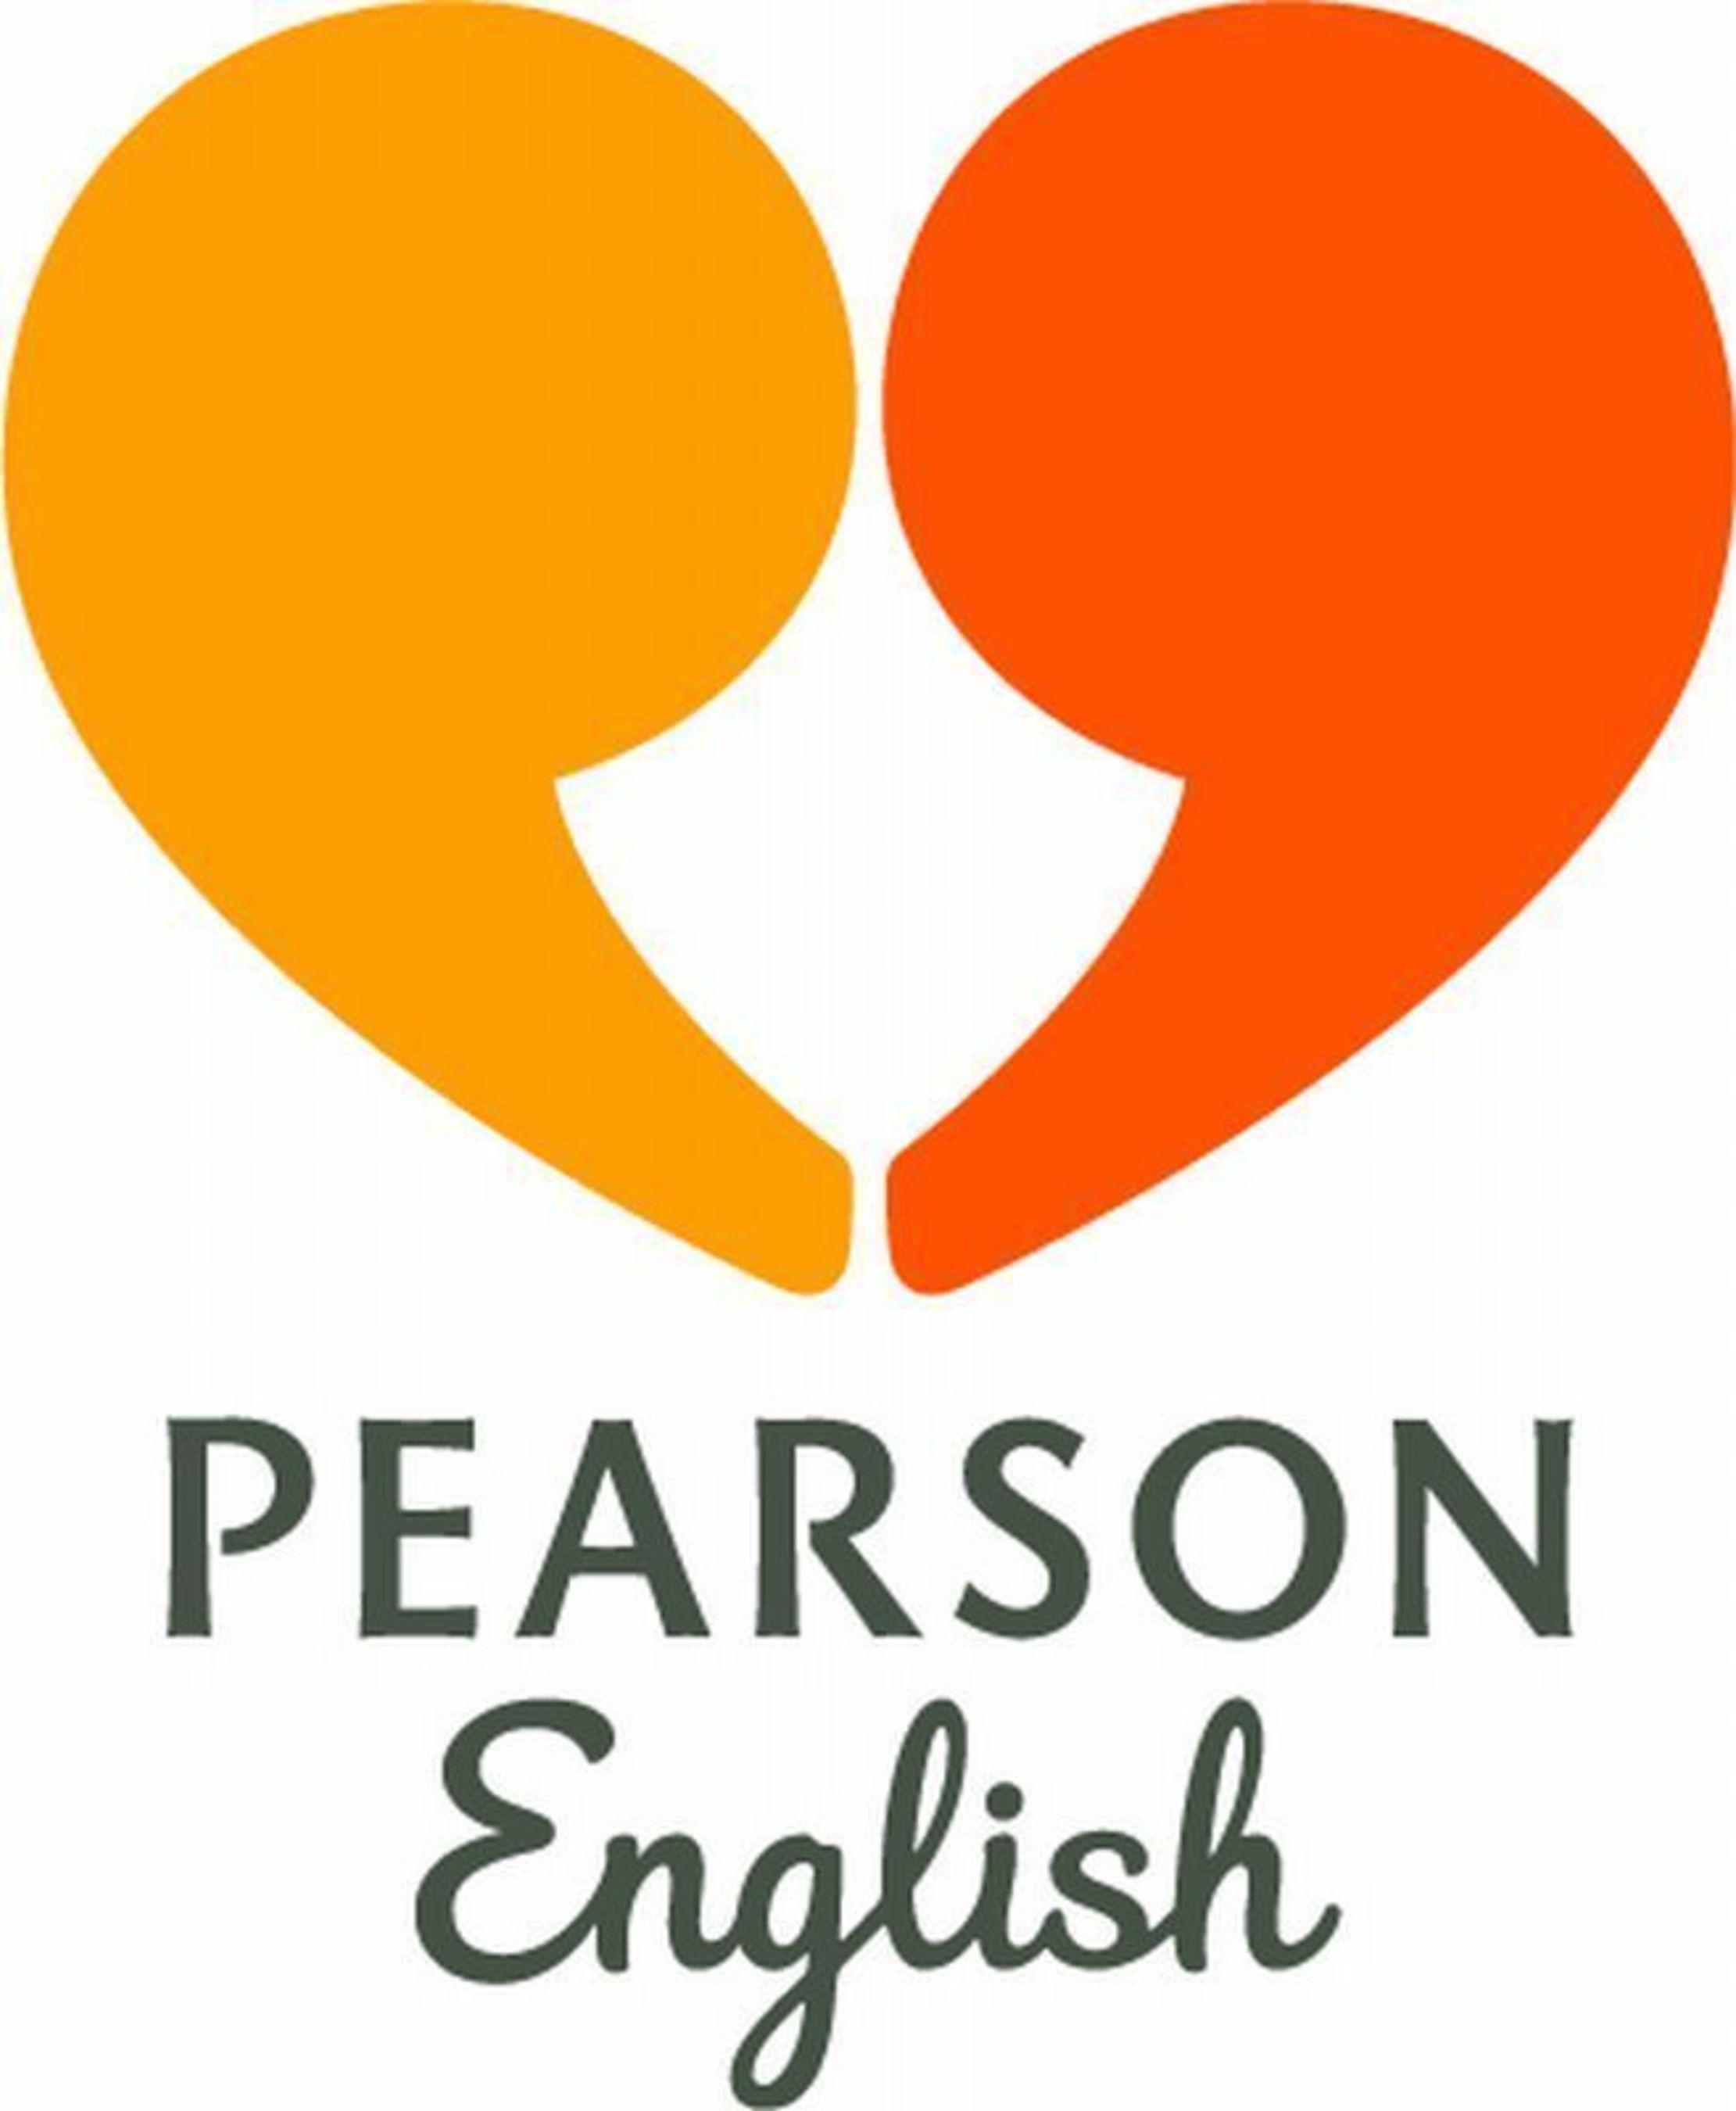 PEARSON English Logo (PRNewsFoto/PEARSON English)